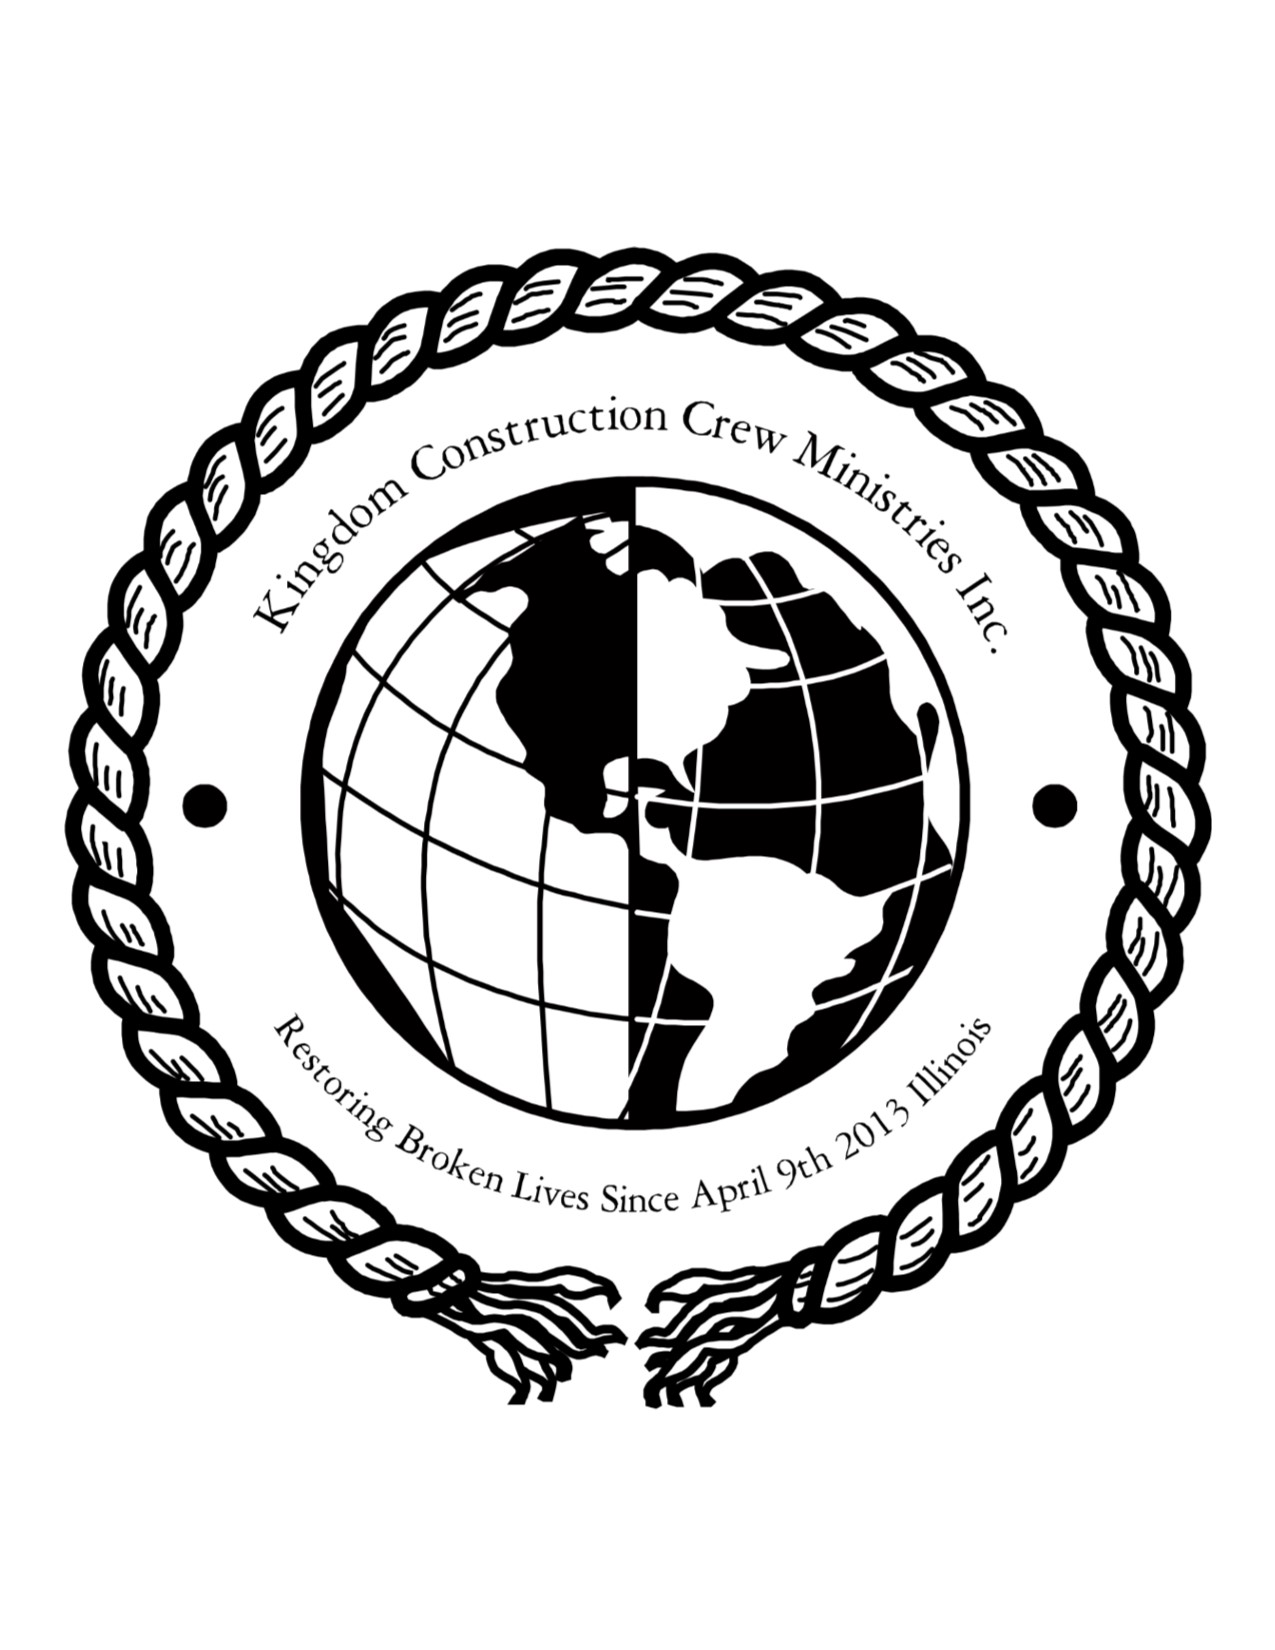 Kingdom Construction Crew Ministries Inc.